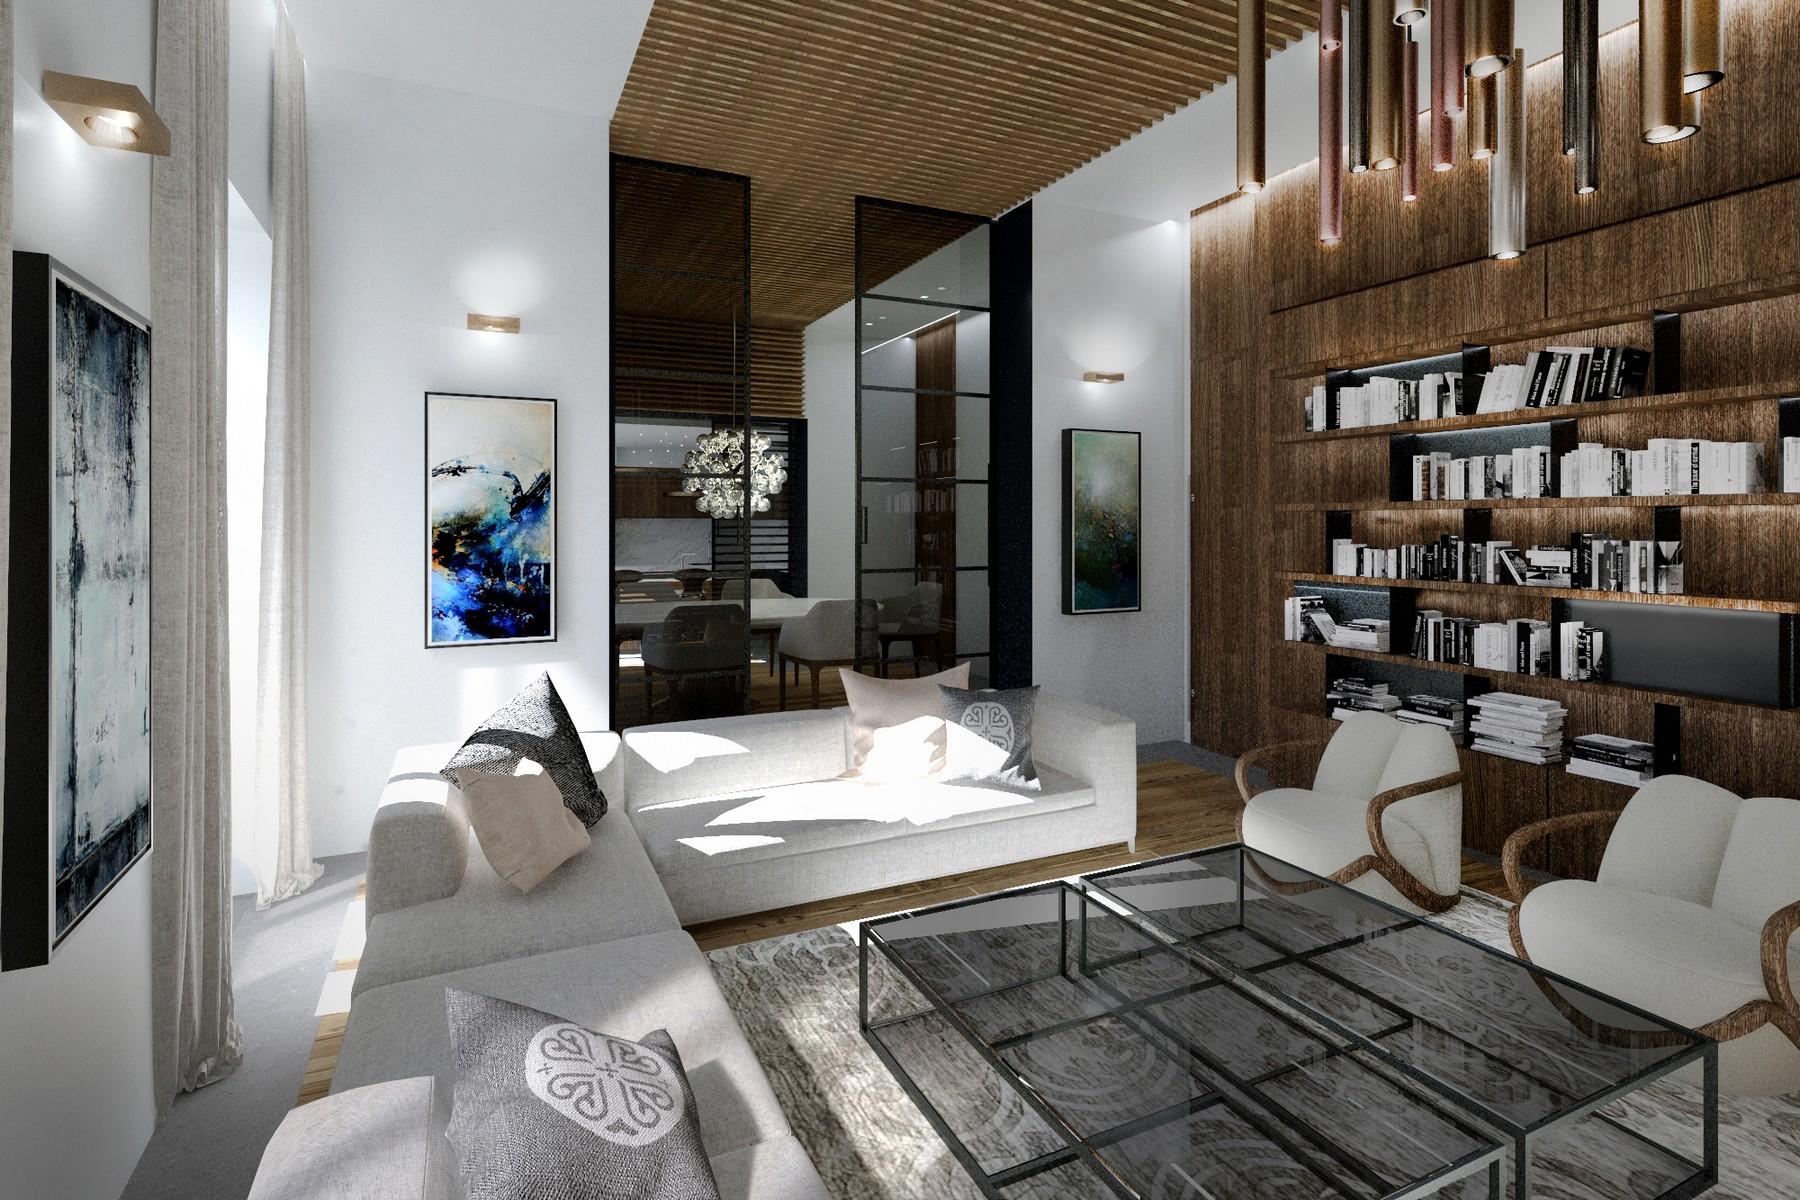 Appartamenti di lusso a firenze trovocasa pregio for Appartamenti a firenze in vendita